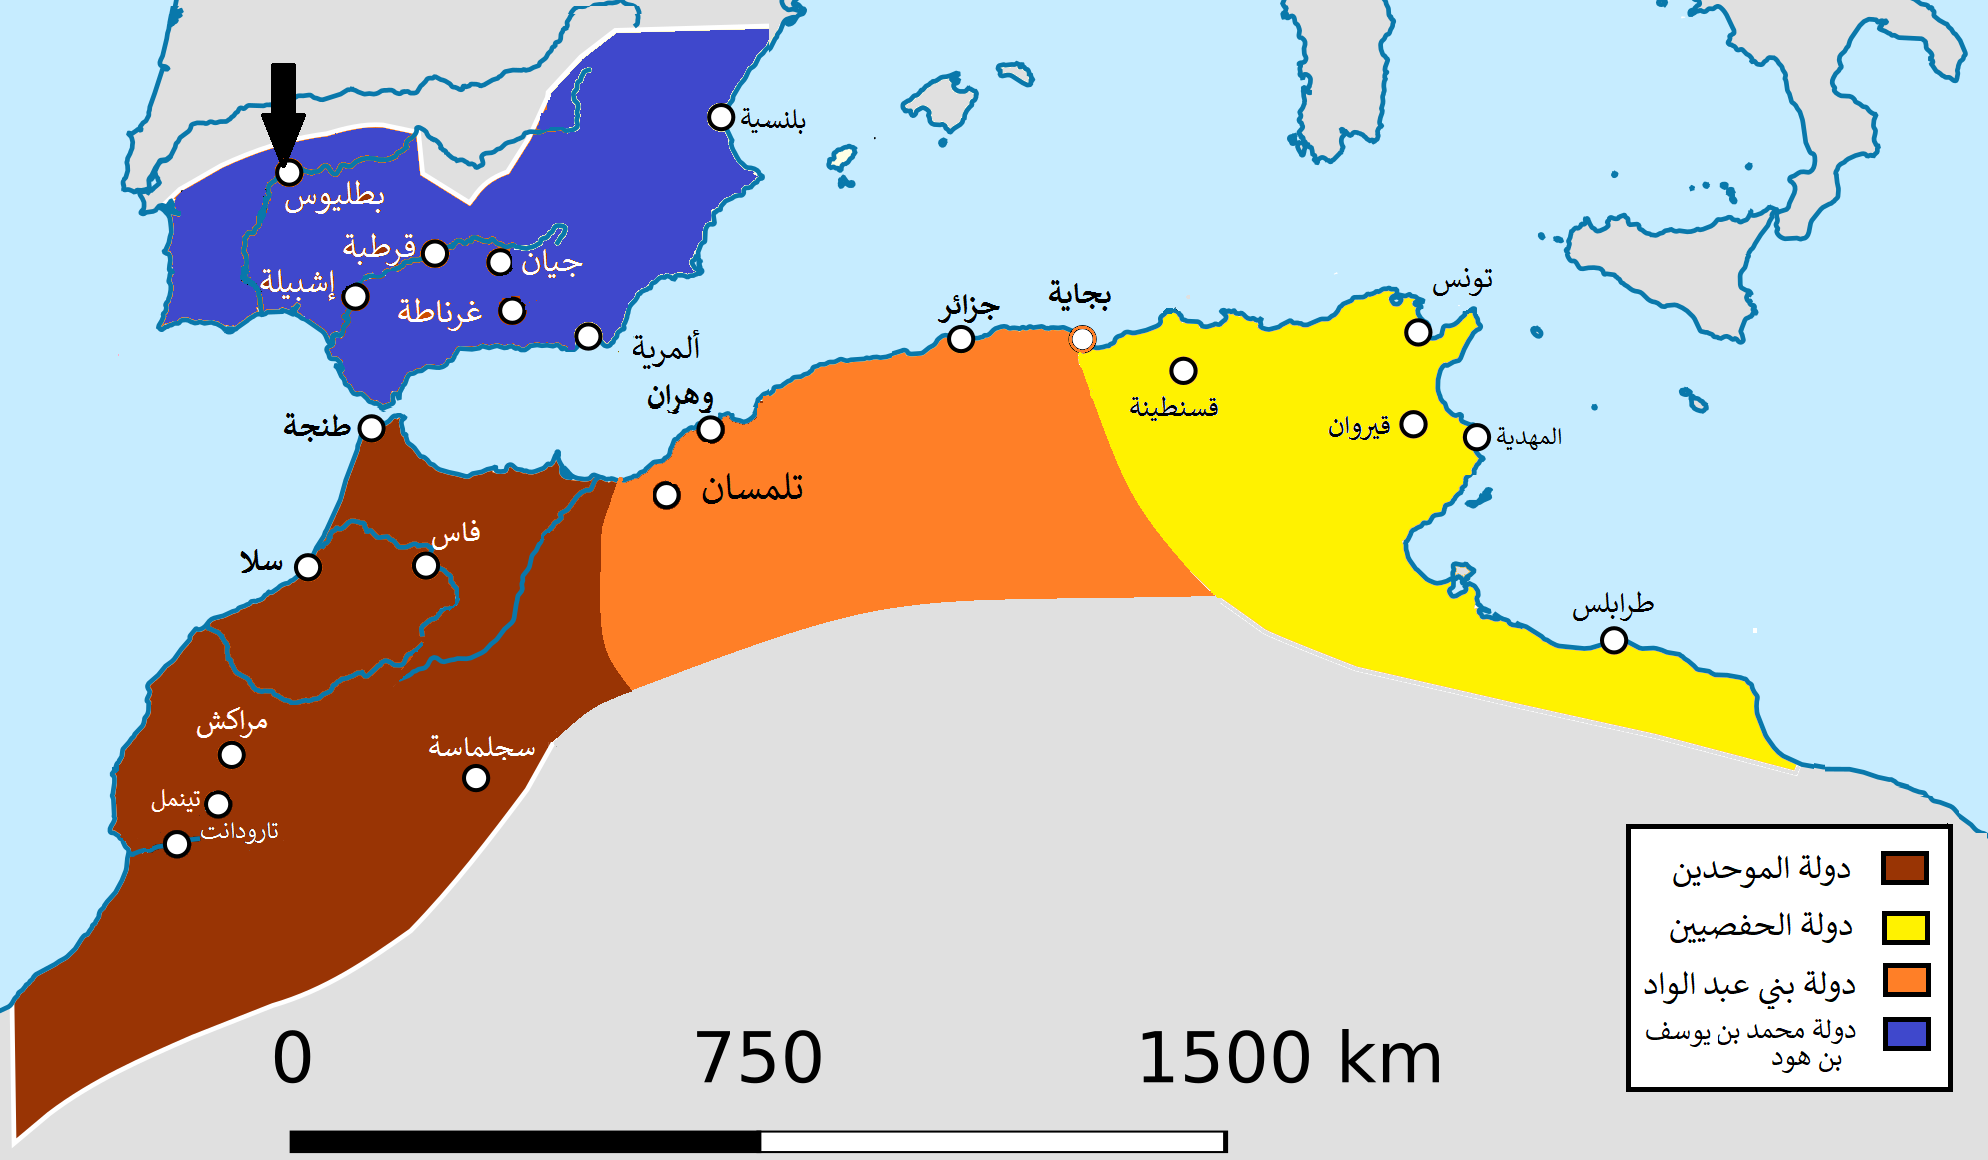 1230-1235